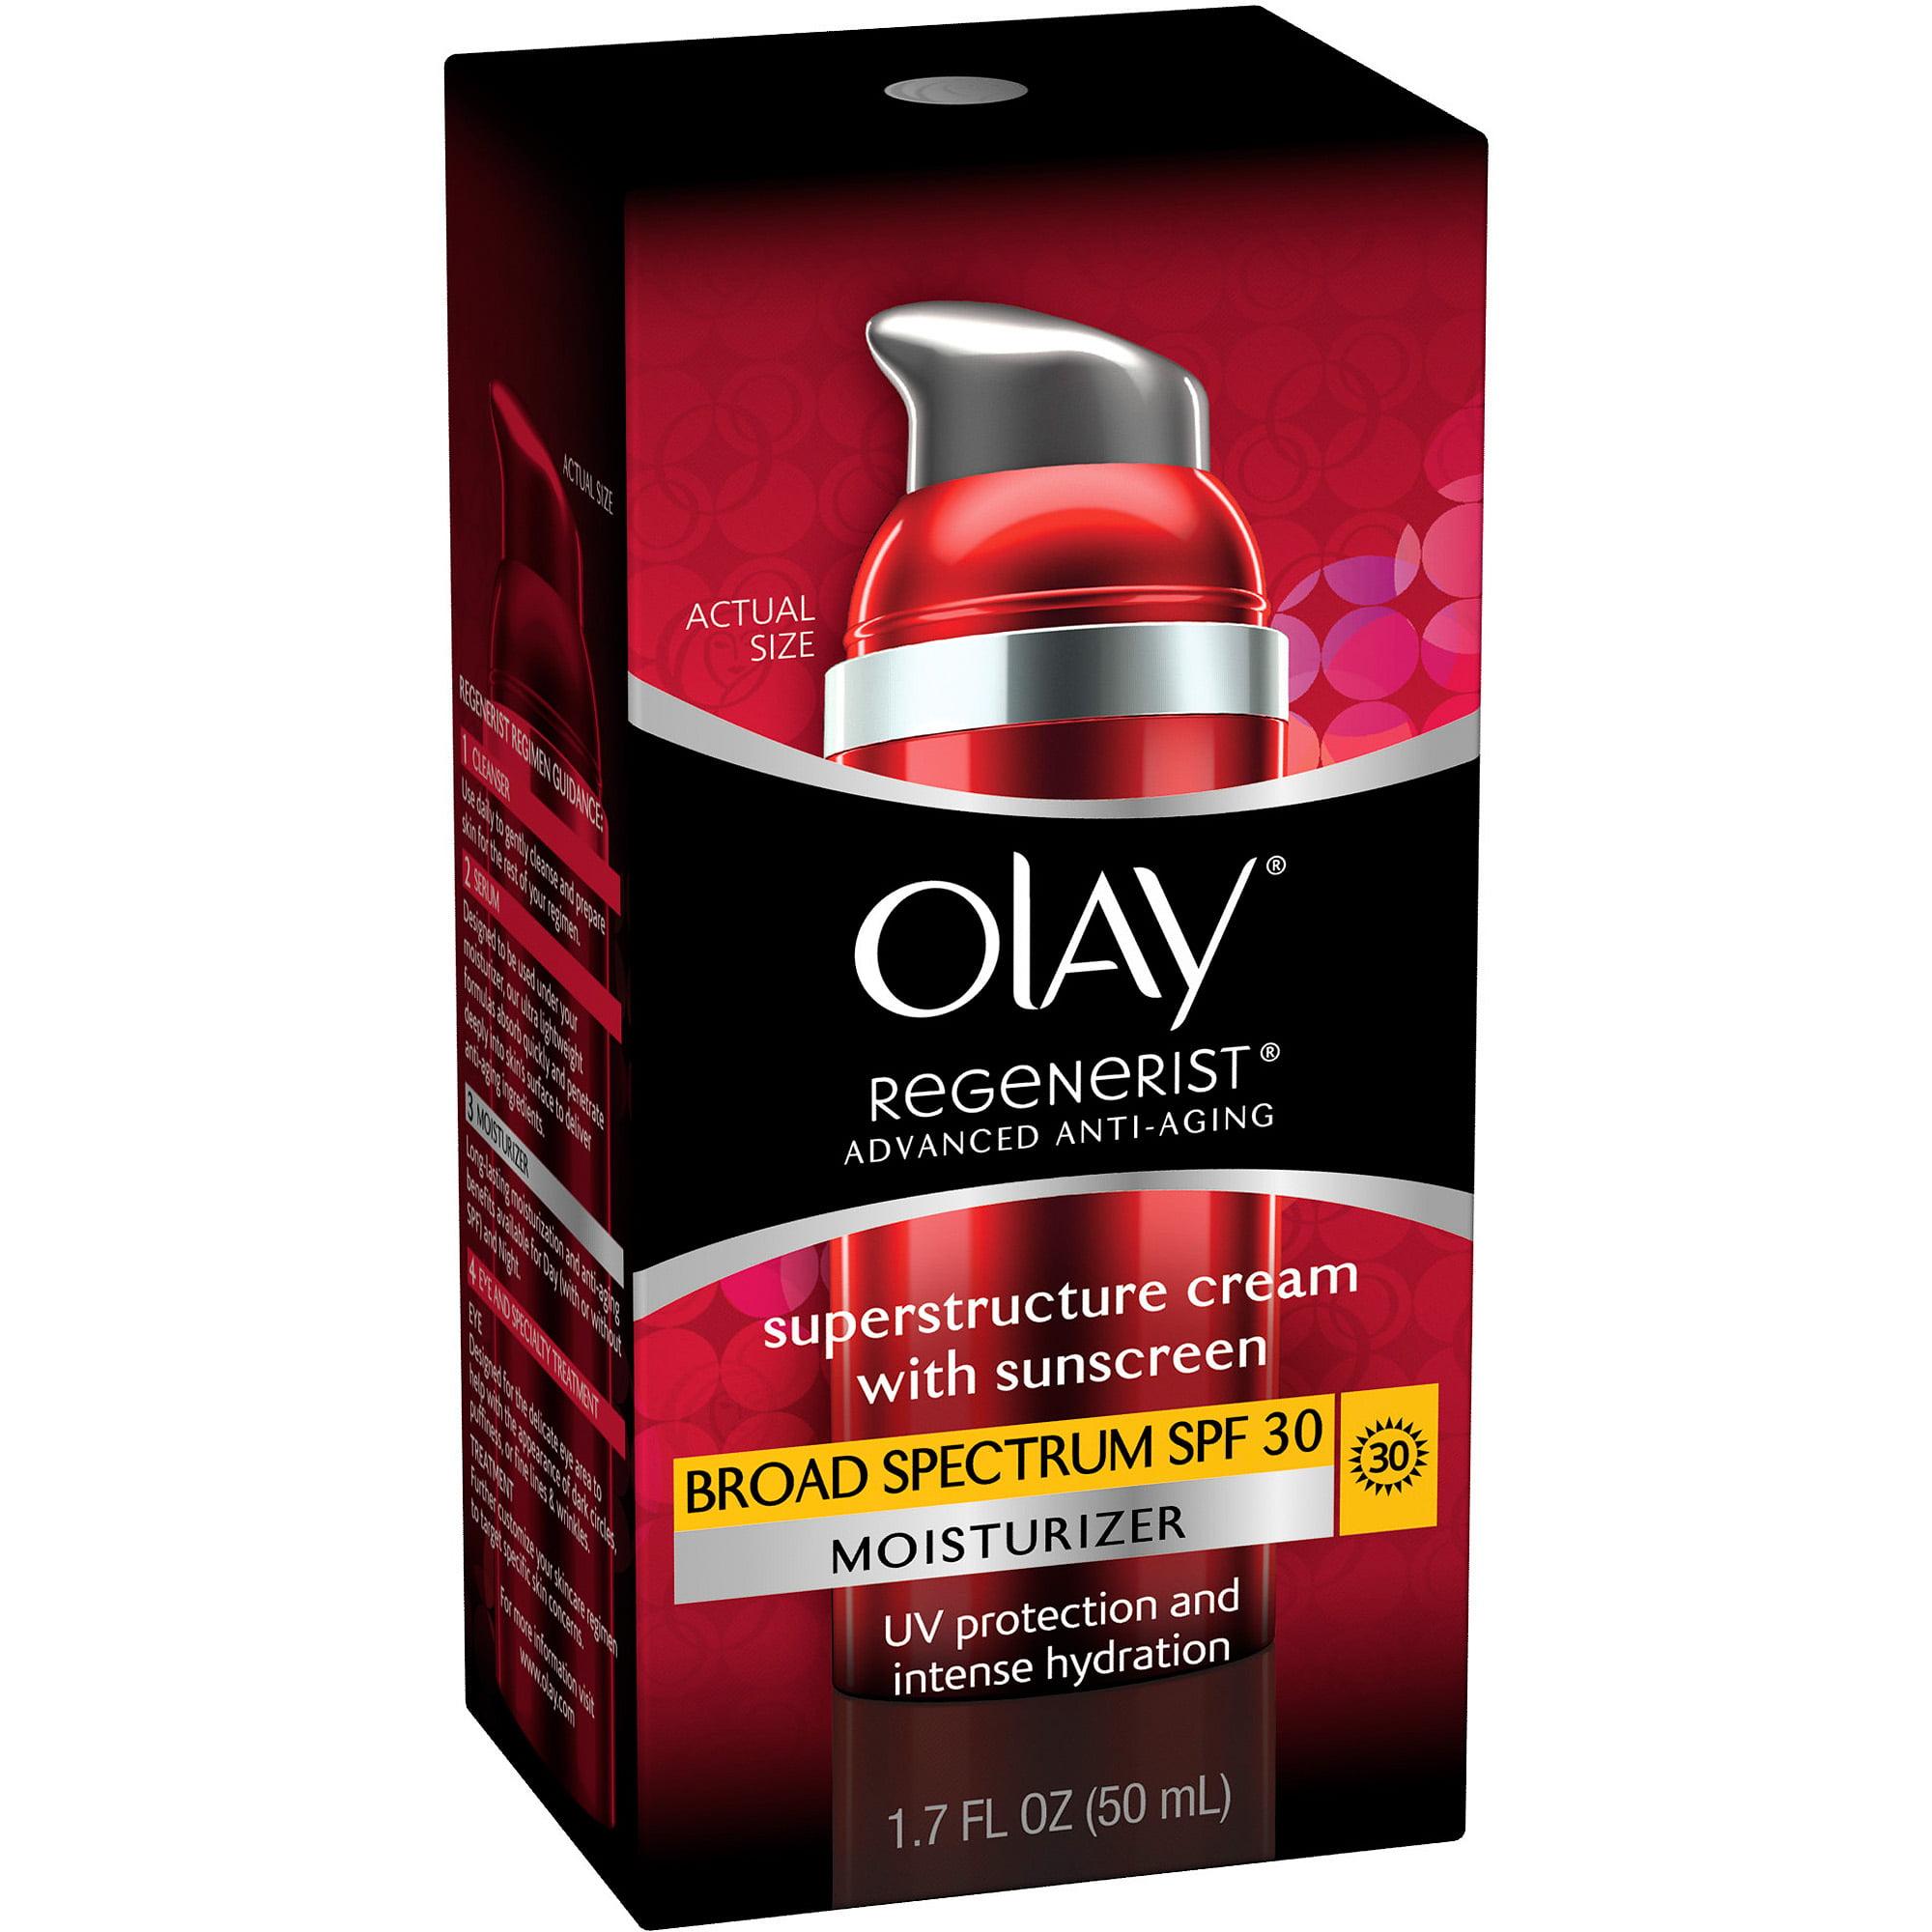 Olay Regenerist Superstructure Cream Facial Moisturizer with Sunscreen Broad Spectrum SPF 30 1.7 Fl Oz